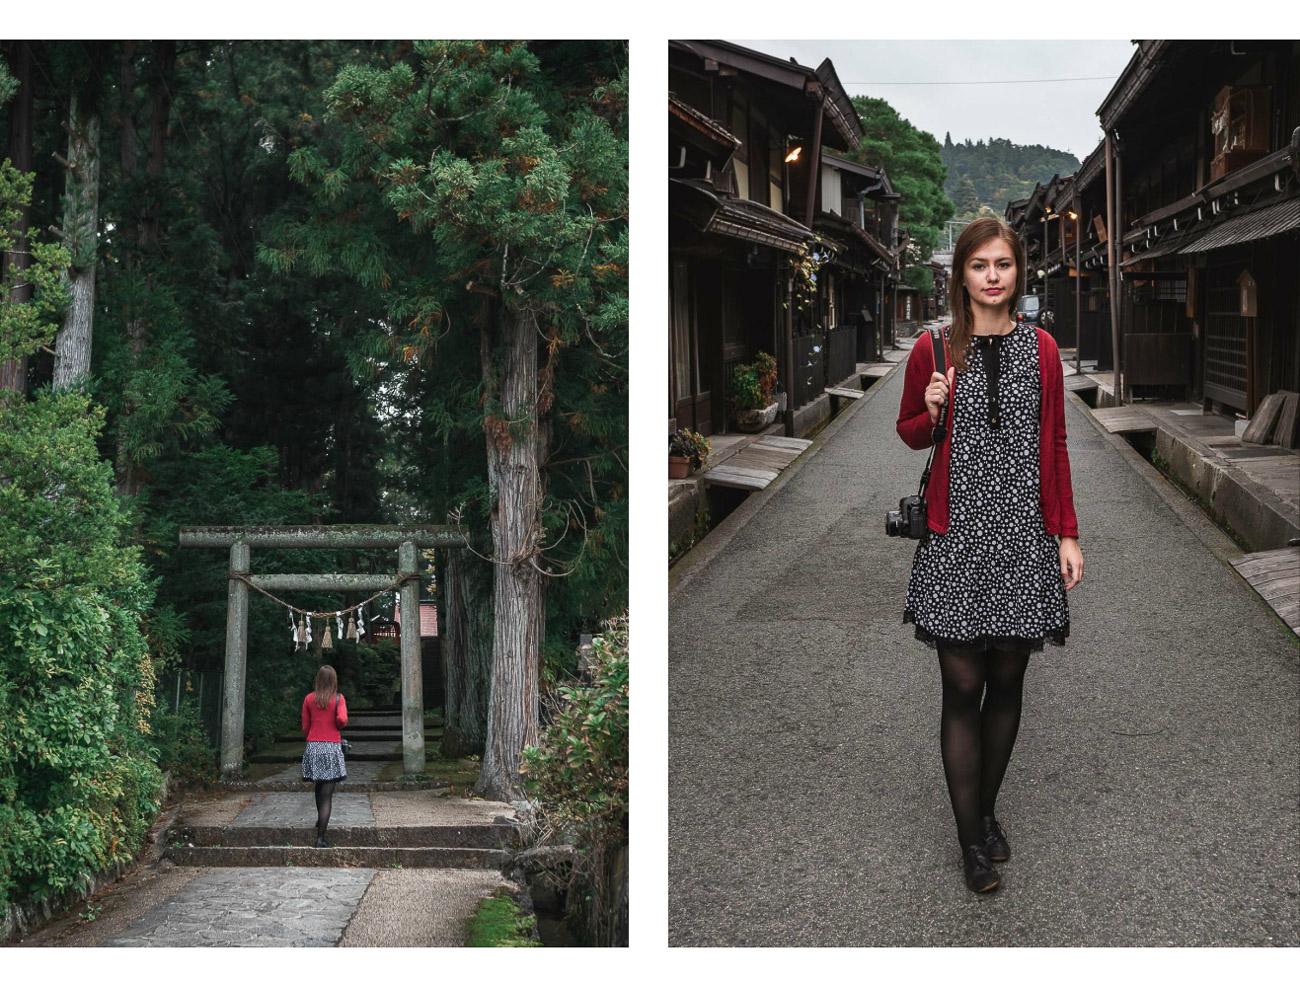 hida-takayama atrakcje